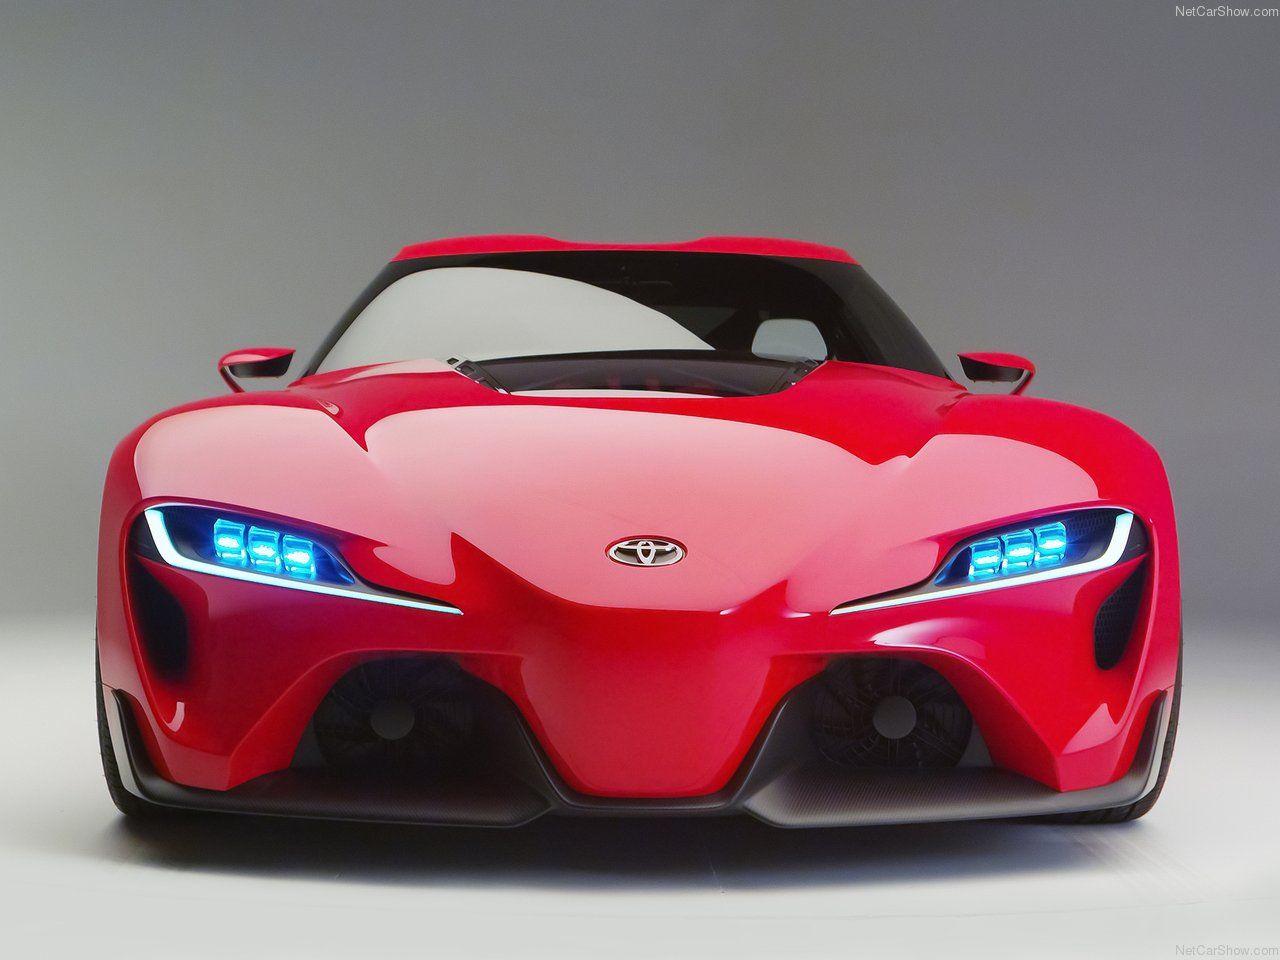 2014 Toyota FT 1 Concept